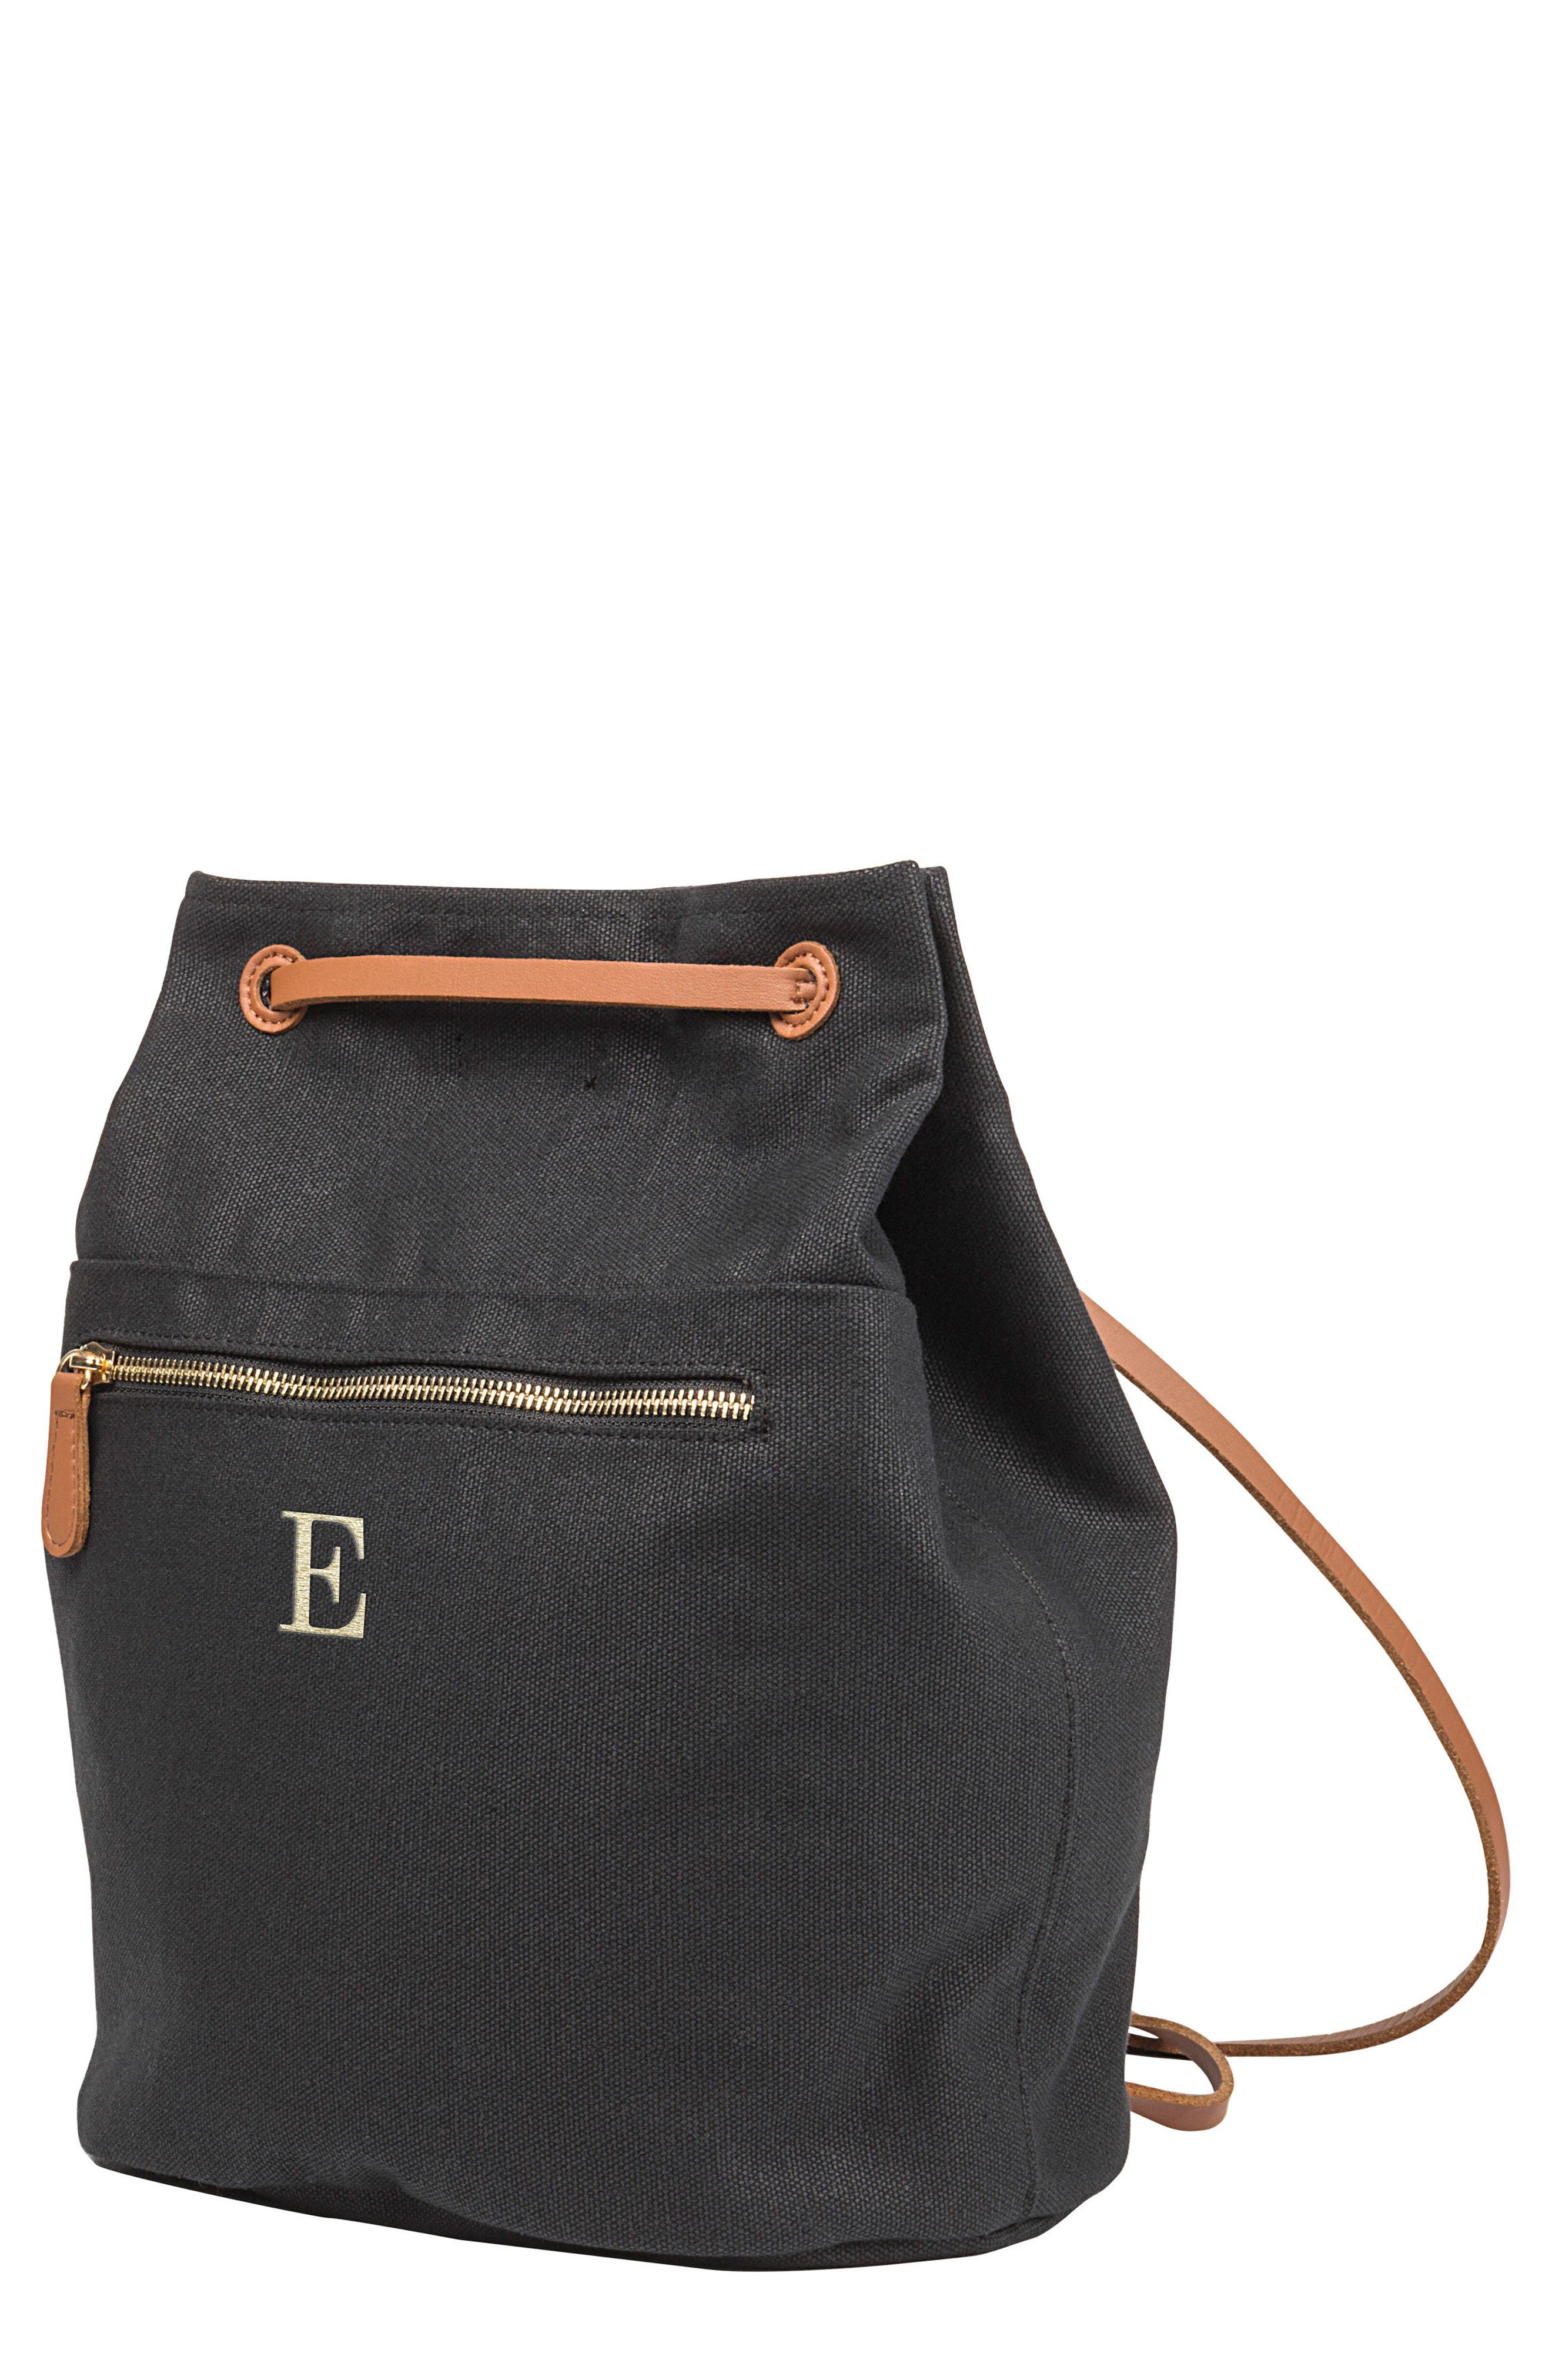 Monogram Convertible Backpack,                             Main thumbnail 6, color,